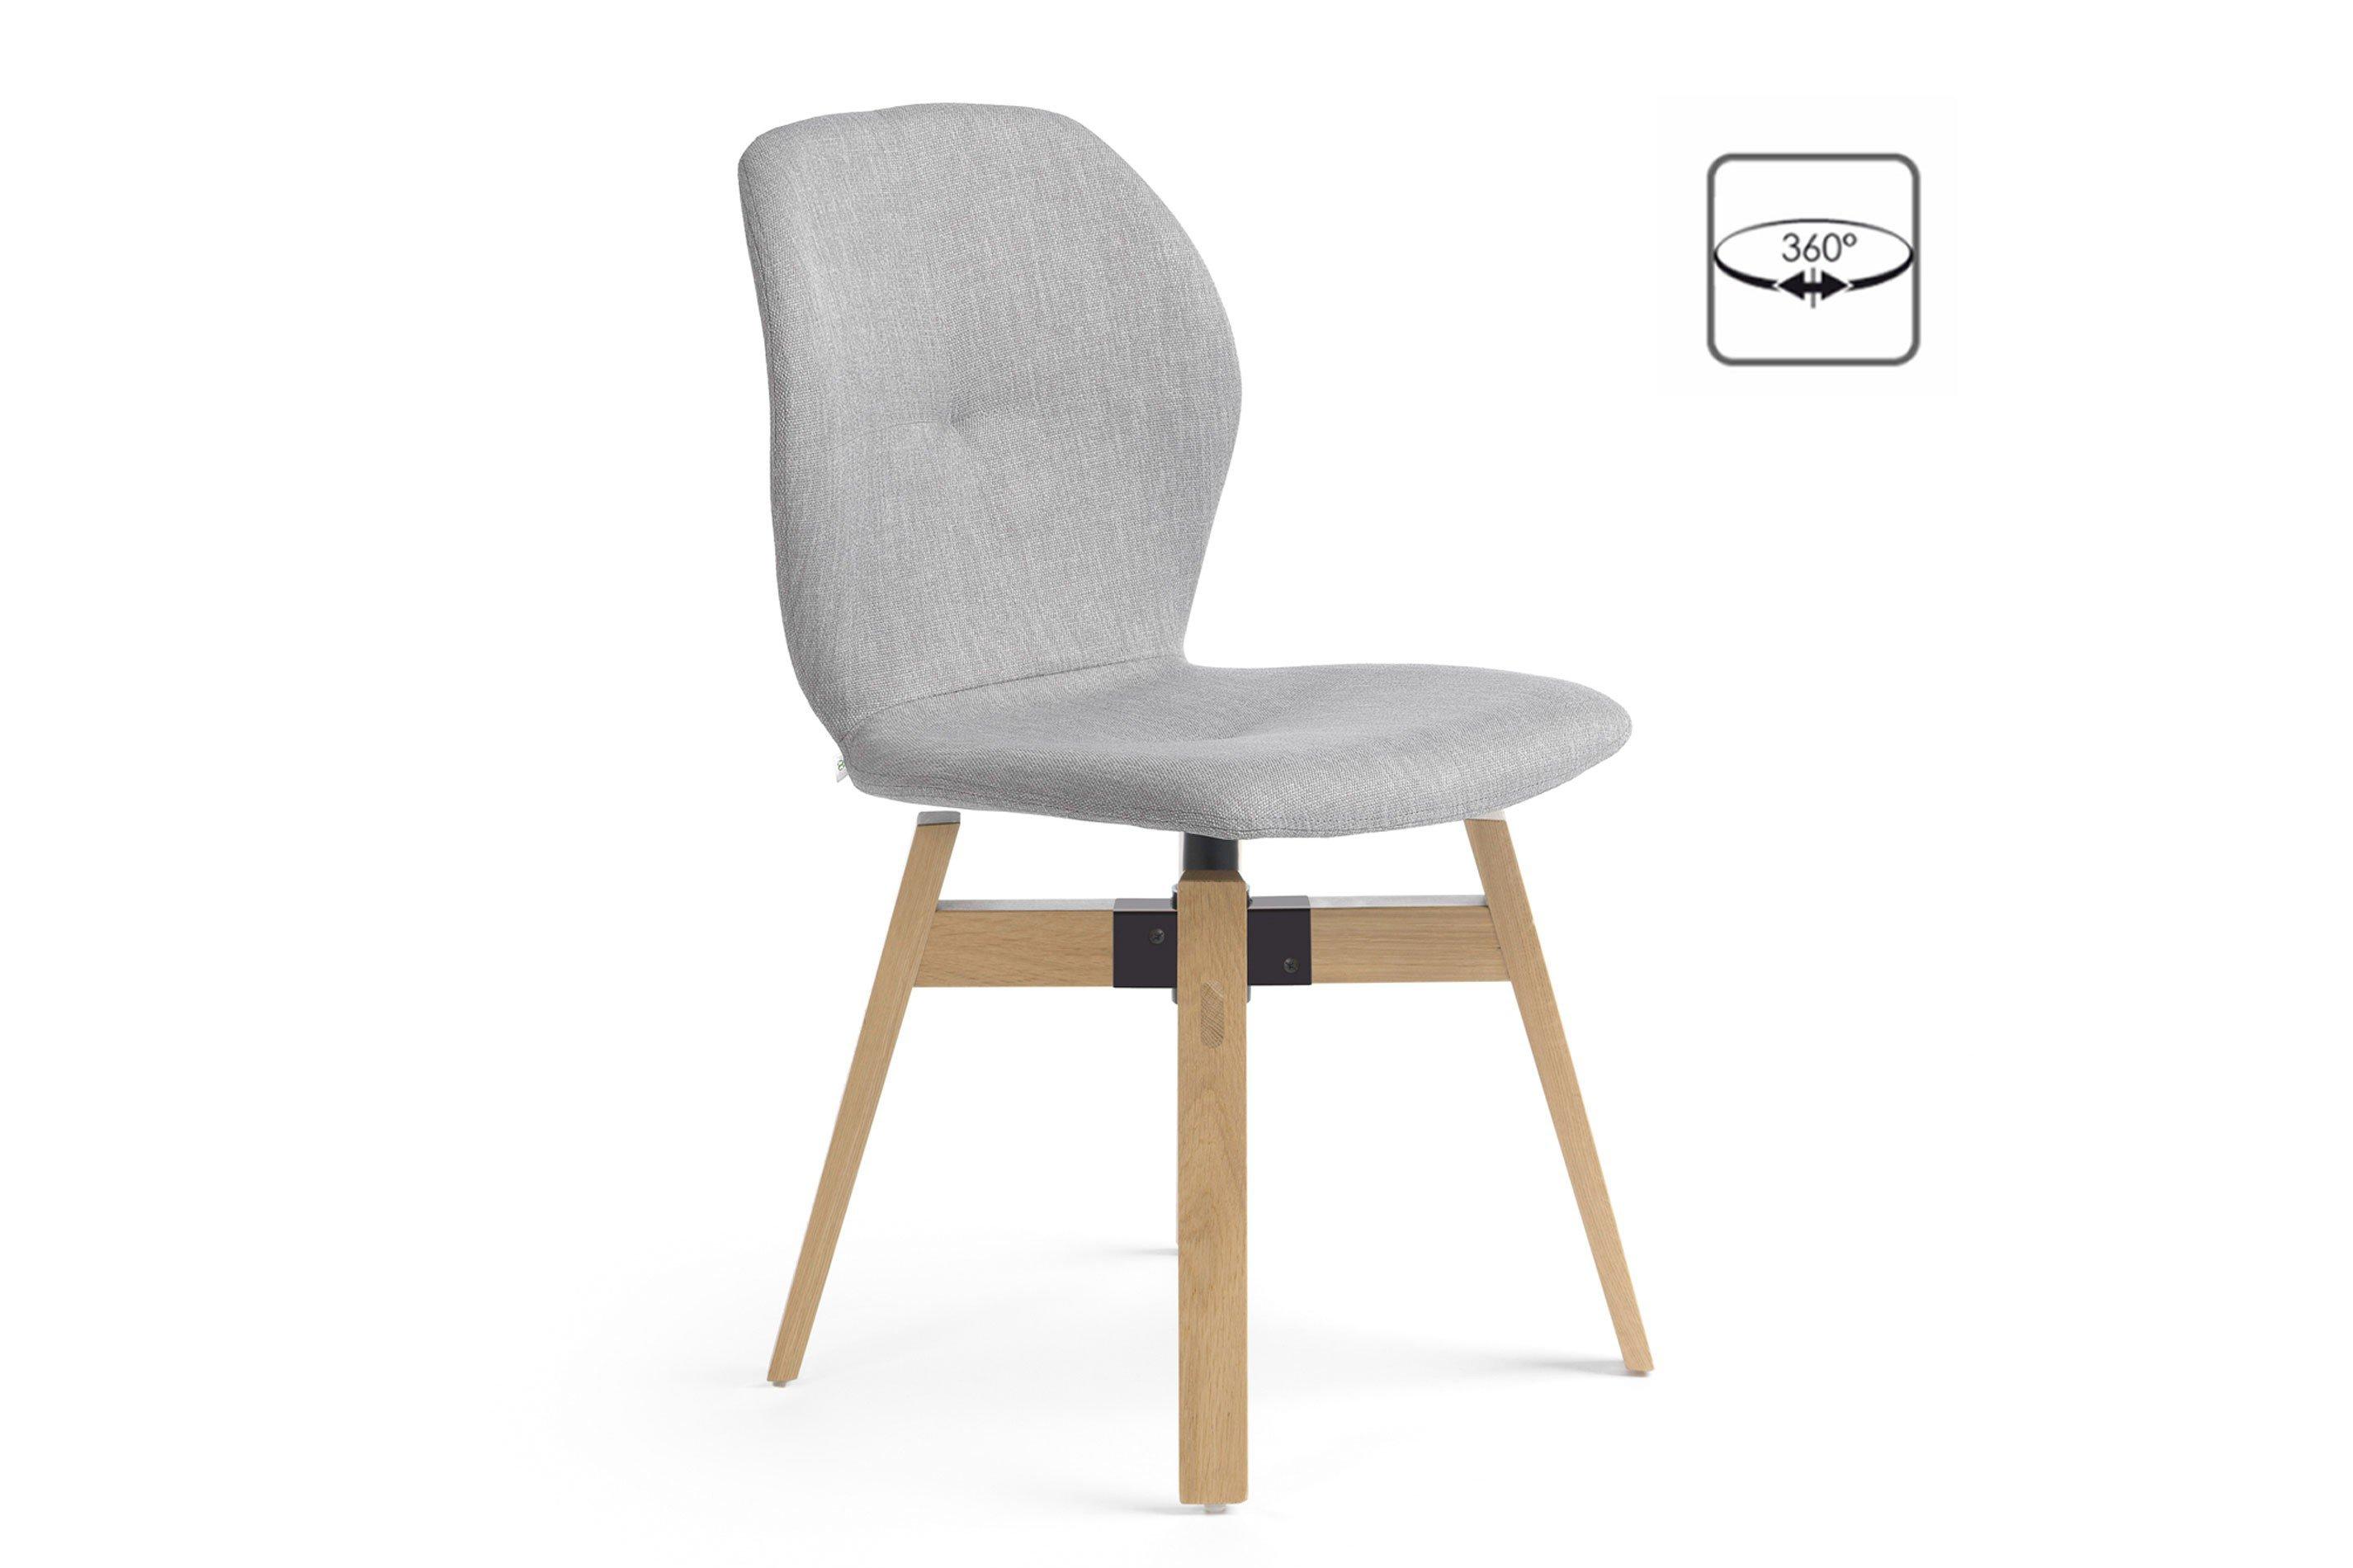 mobitec stuhl mood 91 uni eiche silver mit drehbarem sitz m bel letz ihr online shop. Black Bedroom Furniture Sets. Home Design Ideas